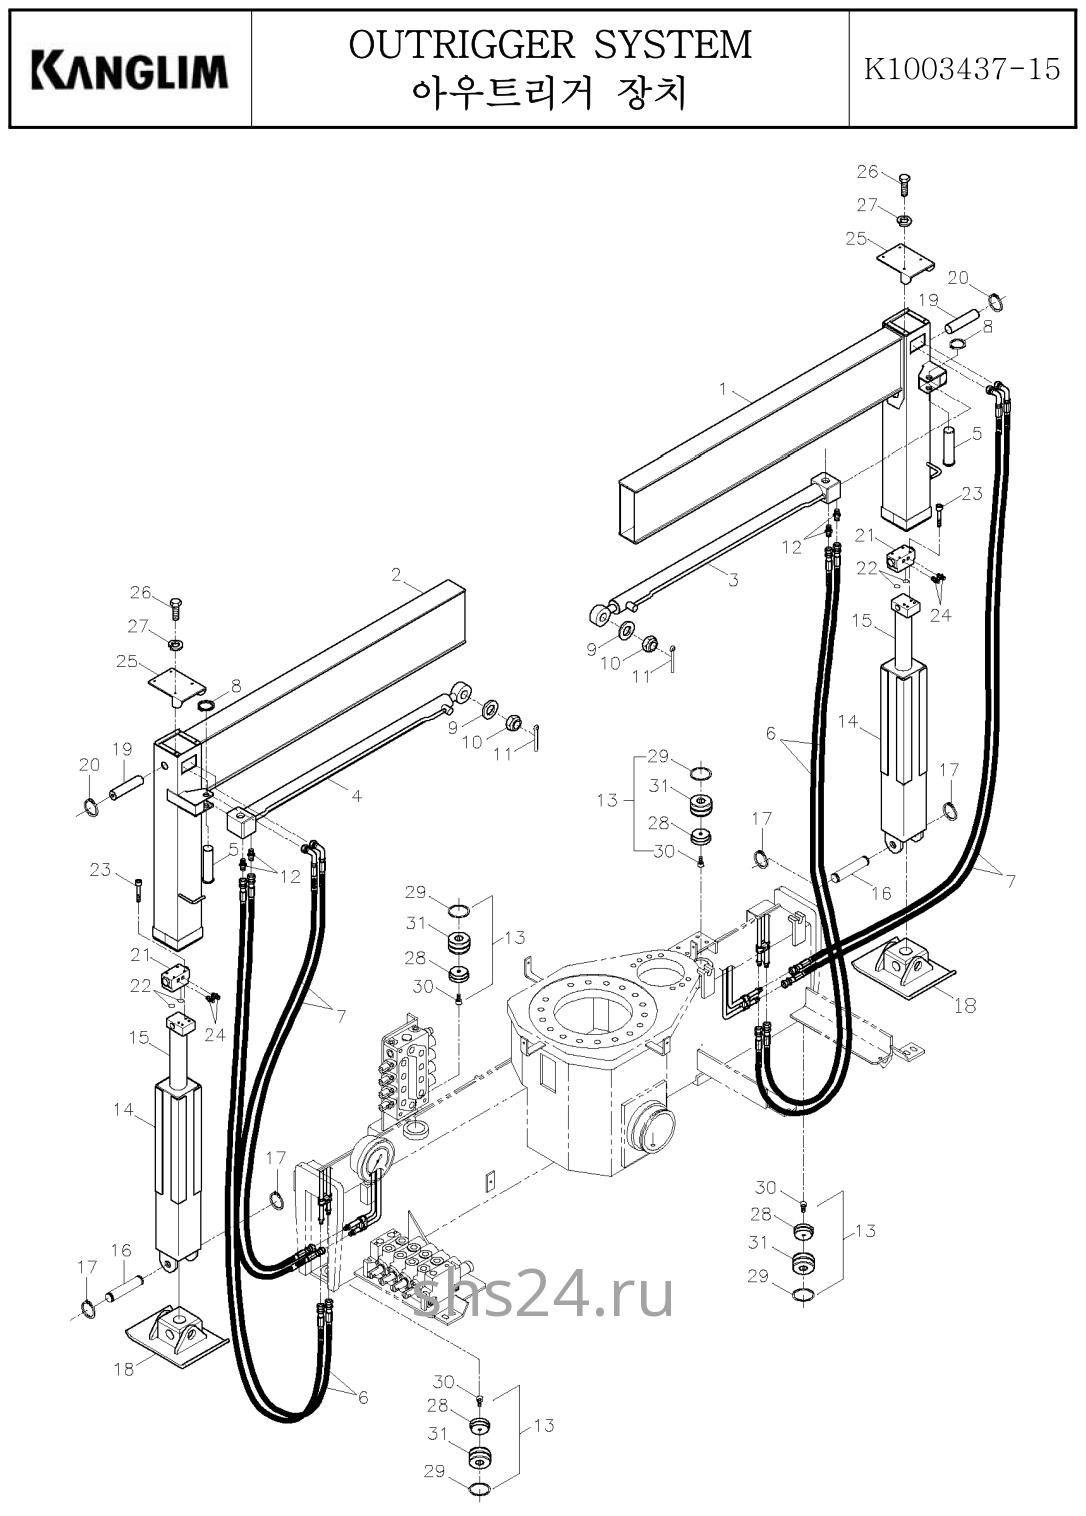 Передние опоры(аутриггеры) Kanglim KS 733,734,735